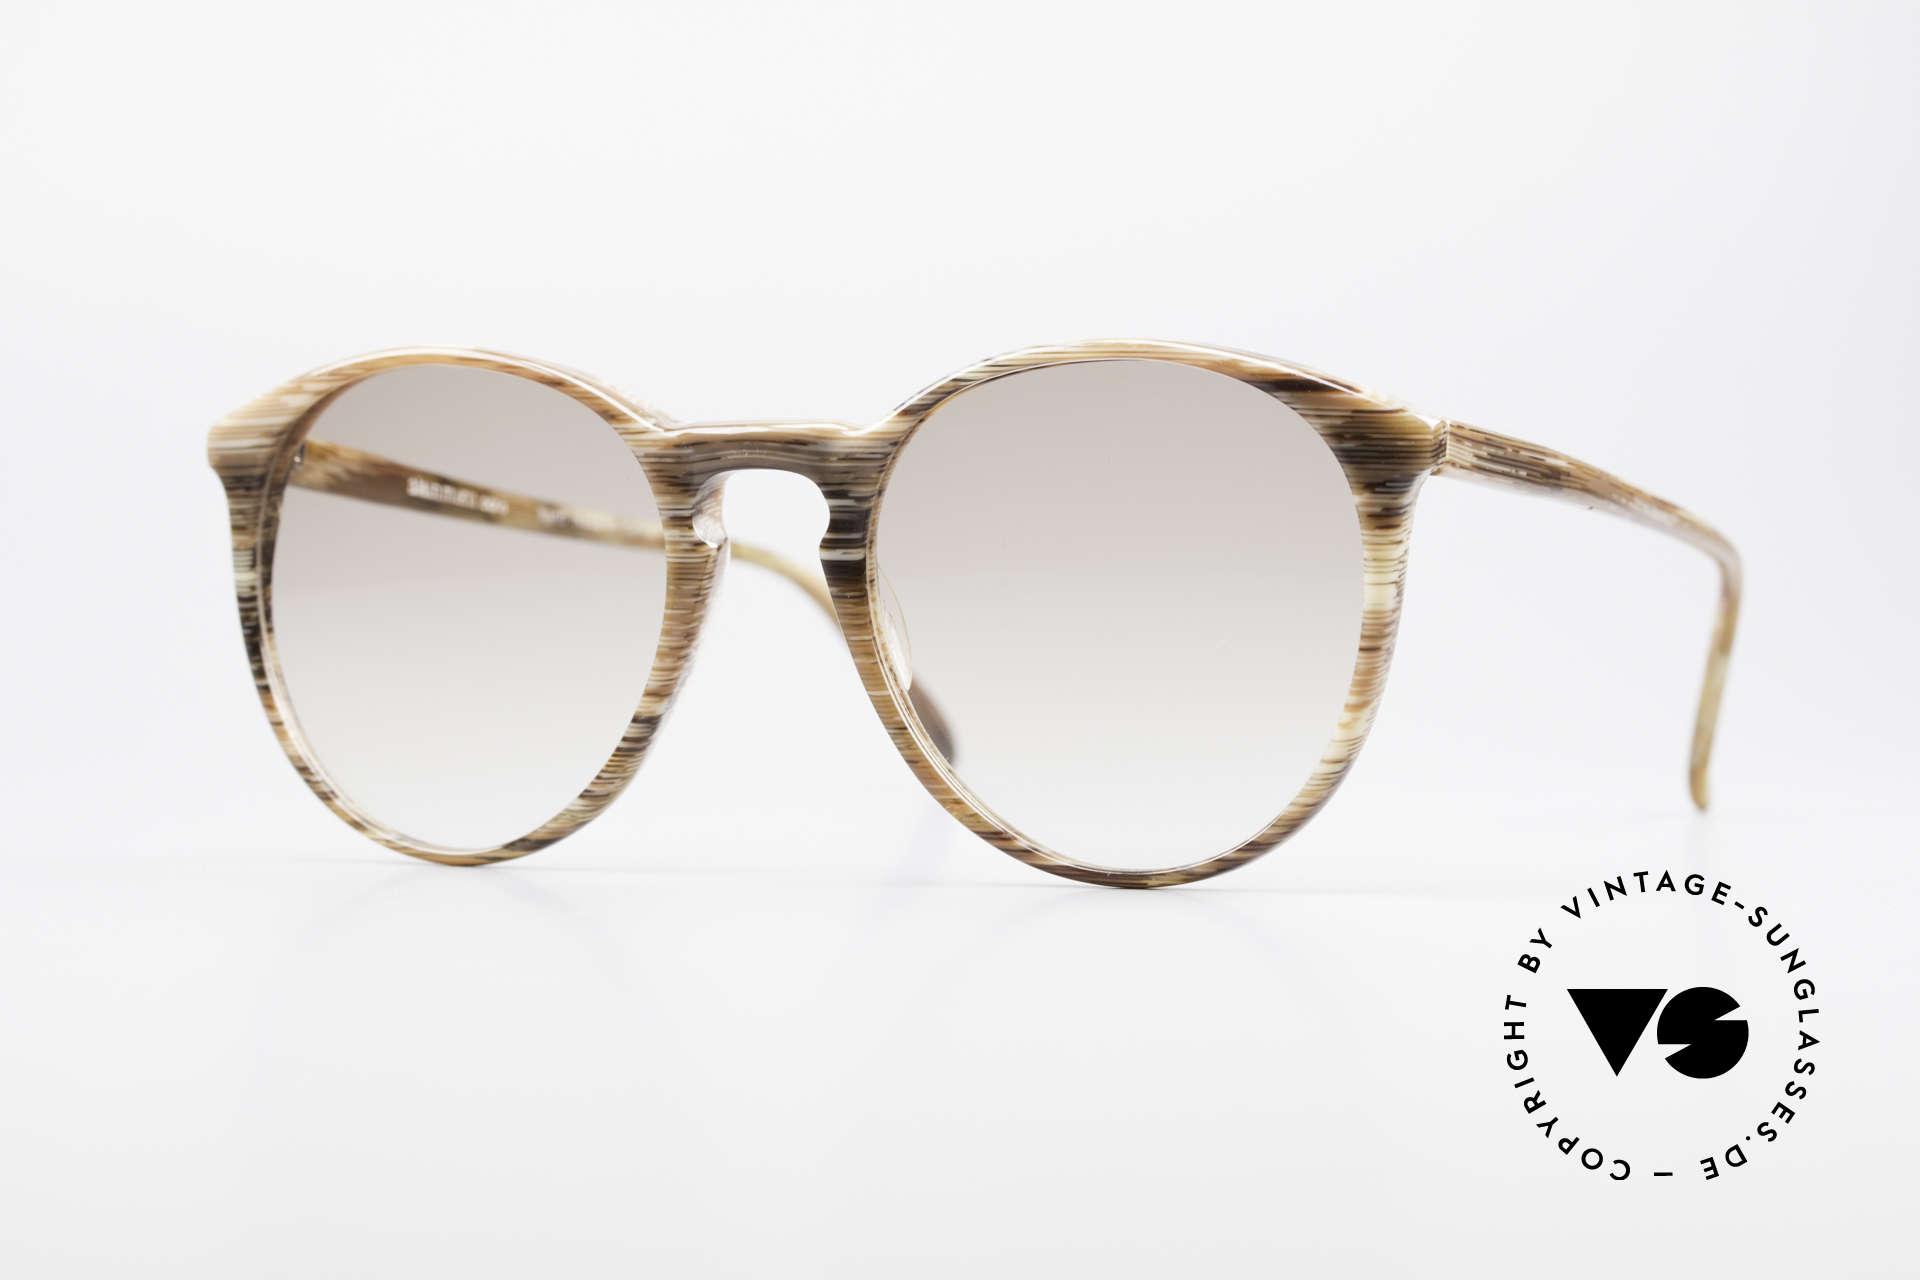 Alain Mikli 901 / 153 Horn Optic Panto Sunglasses, elegant VINTAGE Alain Mikli designer sunglasses, Made for Men and Women